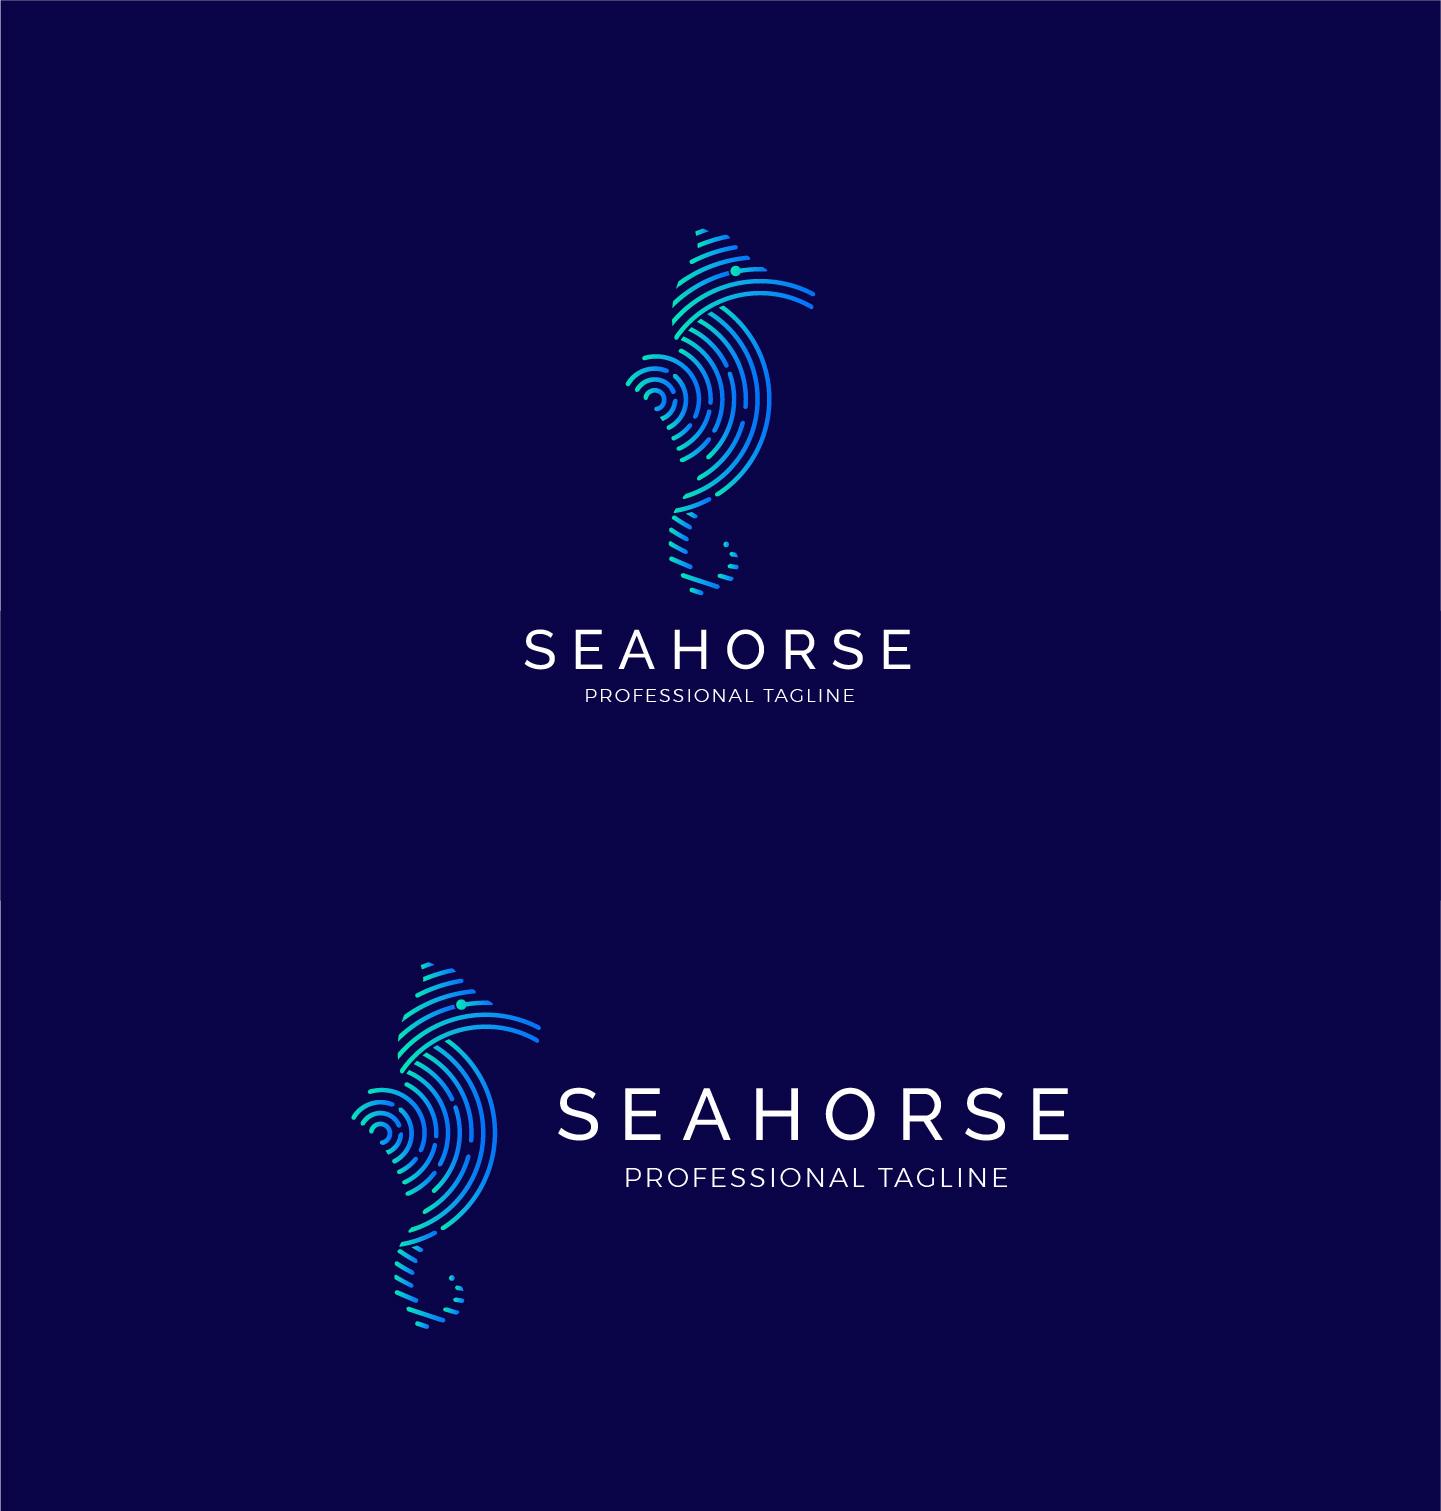 Animal Sea Logo - Seahorse Logo example image 5